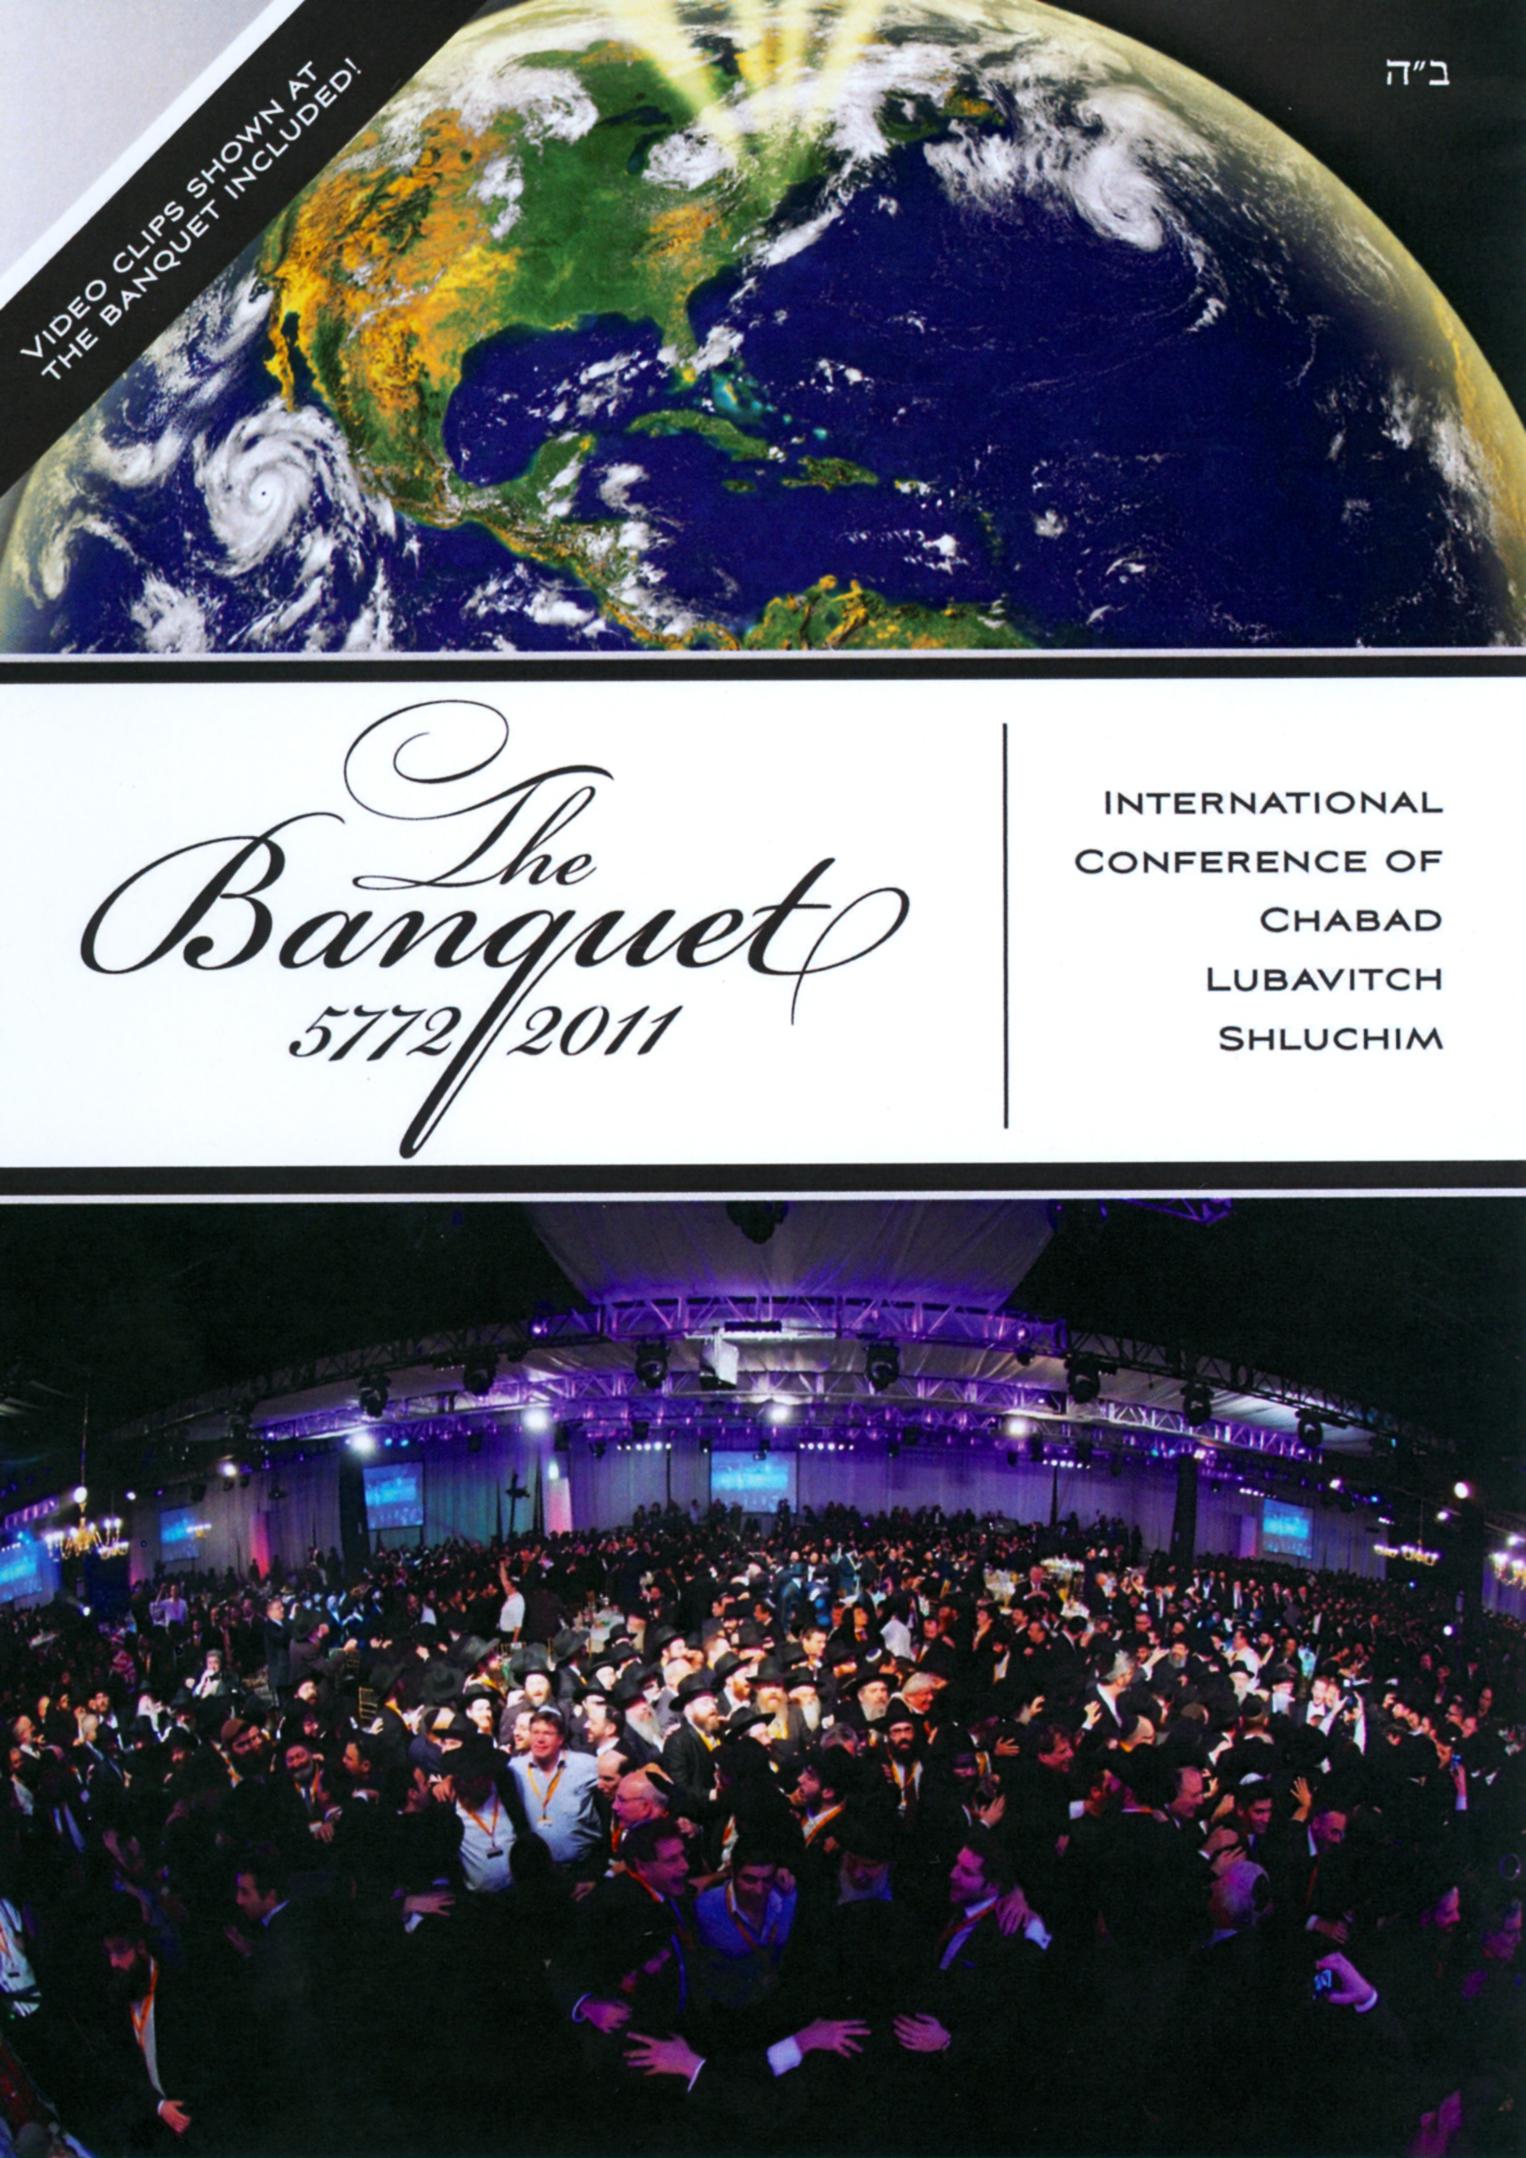 The Banquet: 5772-2011